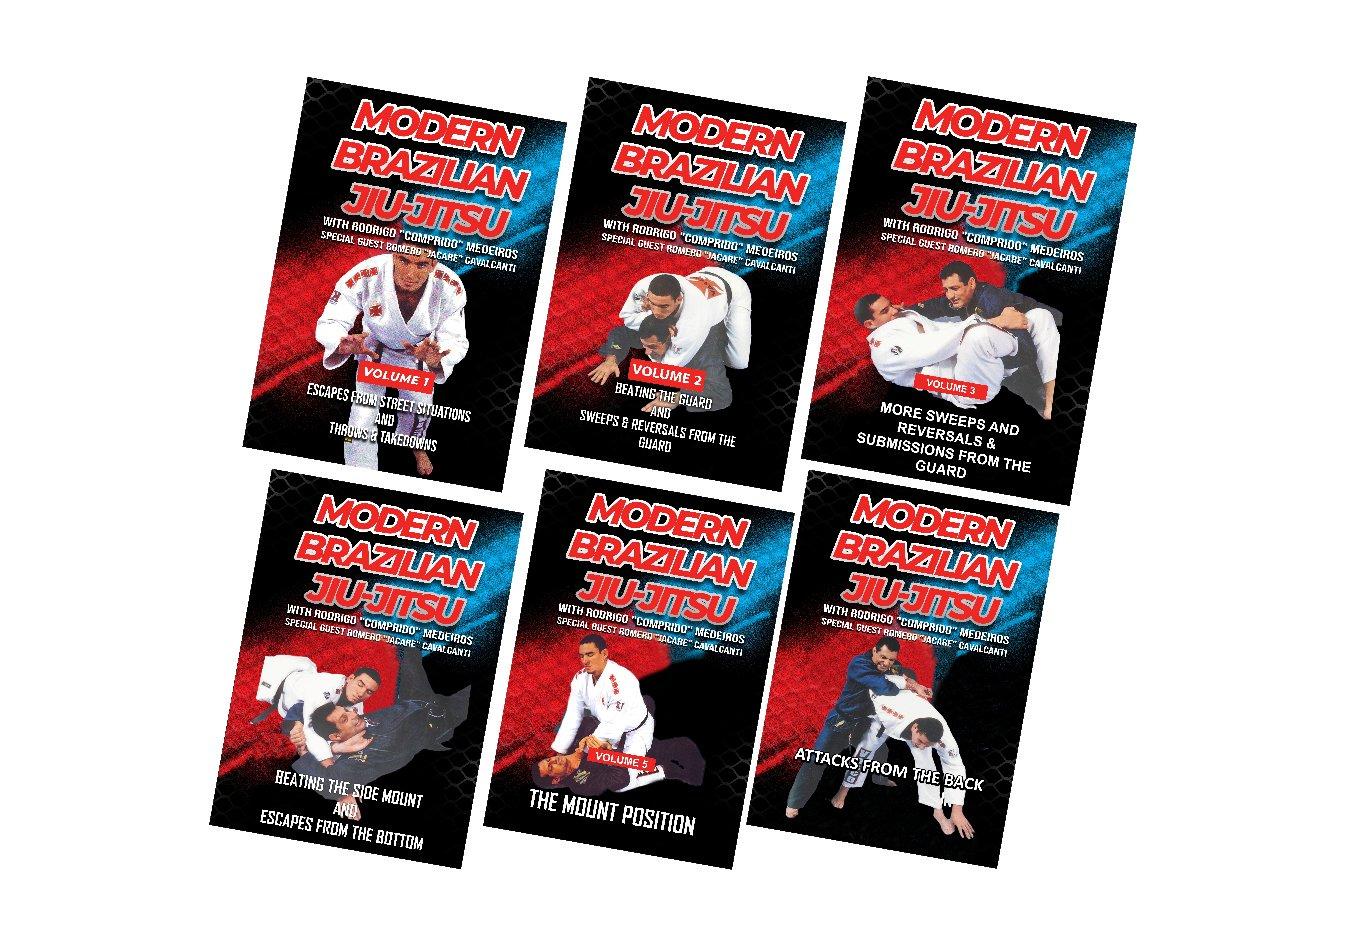 VD5223P  6 DVD SET Modern Brazilian Jiu Jitsu Champ Medeiros escapes sweeps guard mount